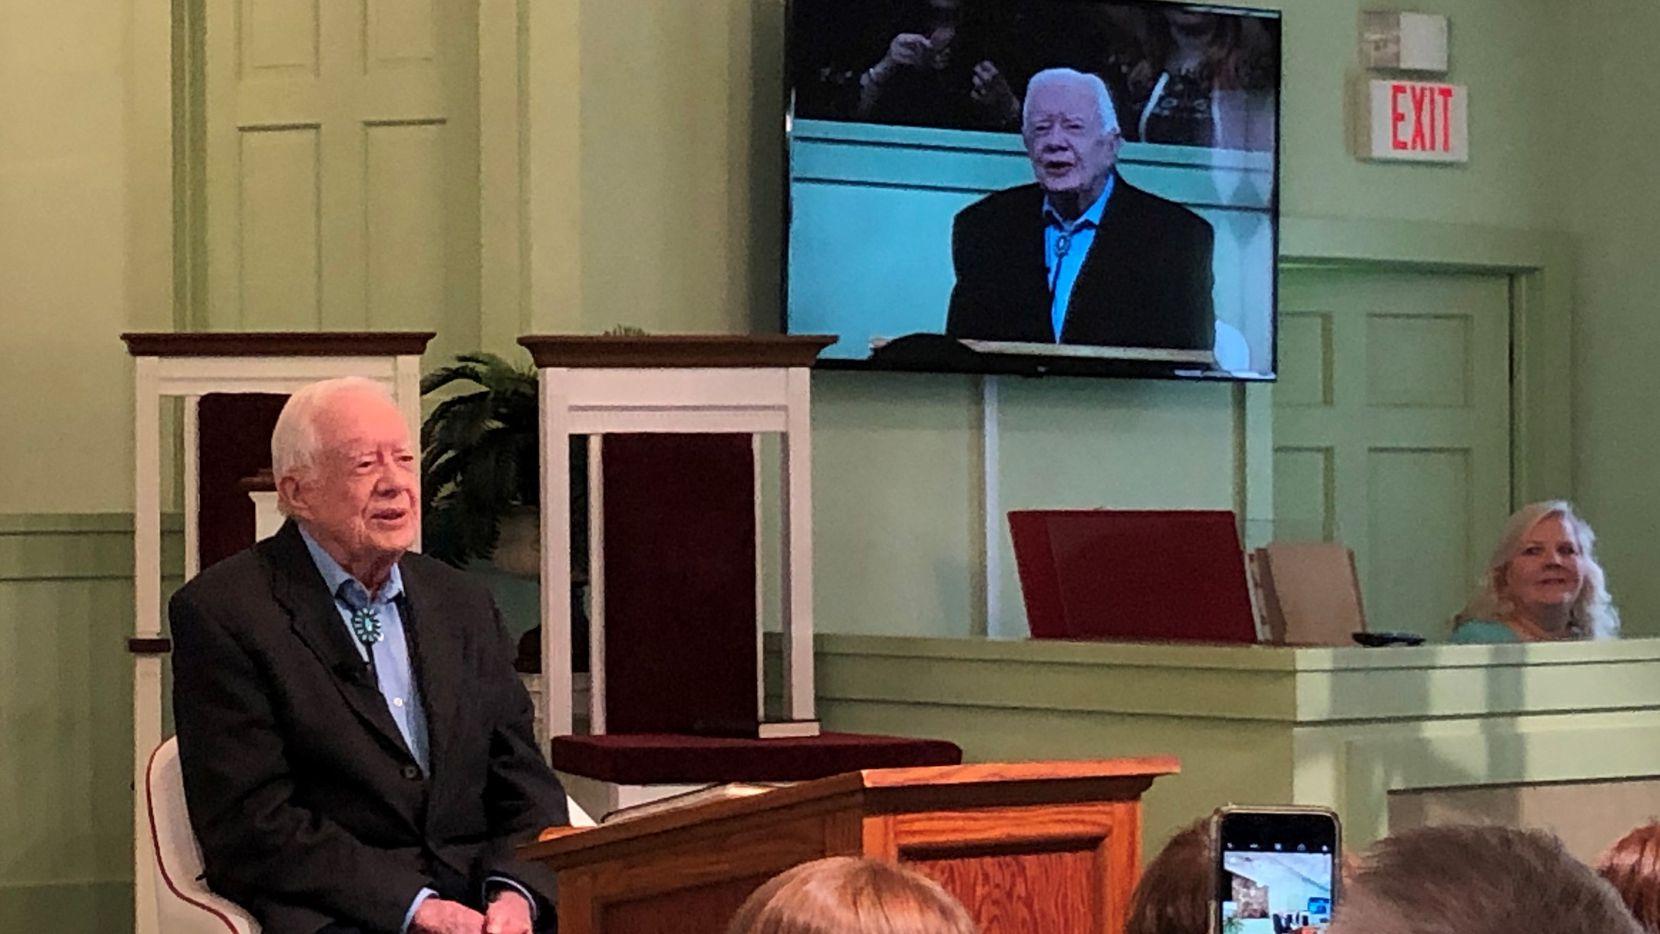 President Jimmy Carter teaches Sunday school at Maranatha Baptist Church in Plains, Ga., twice a month.